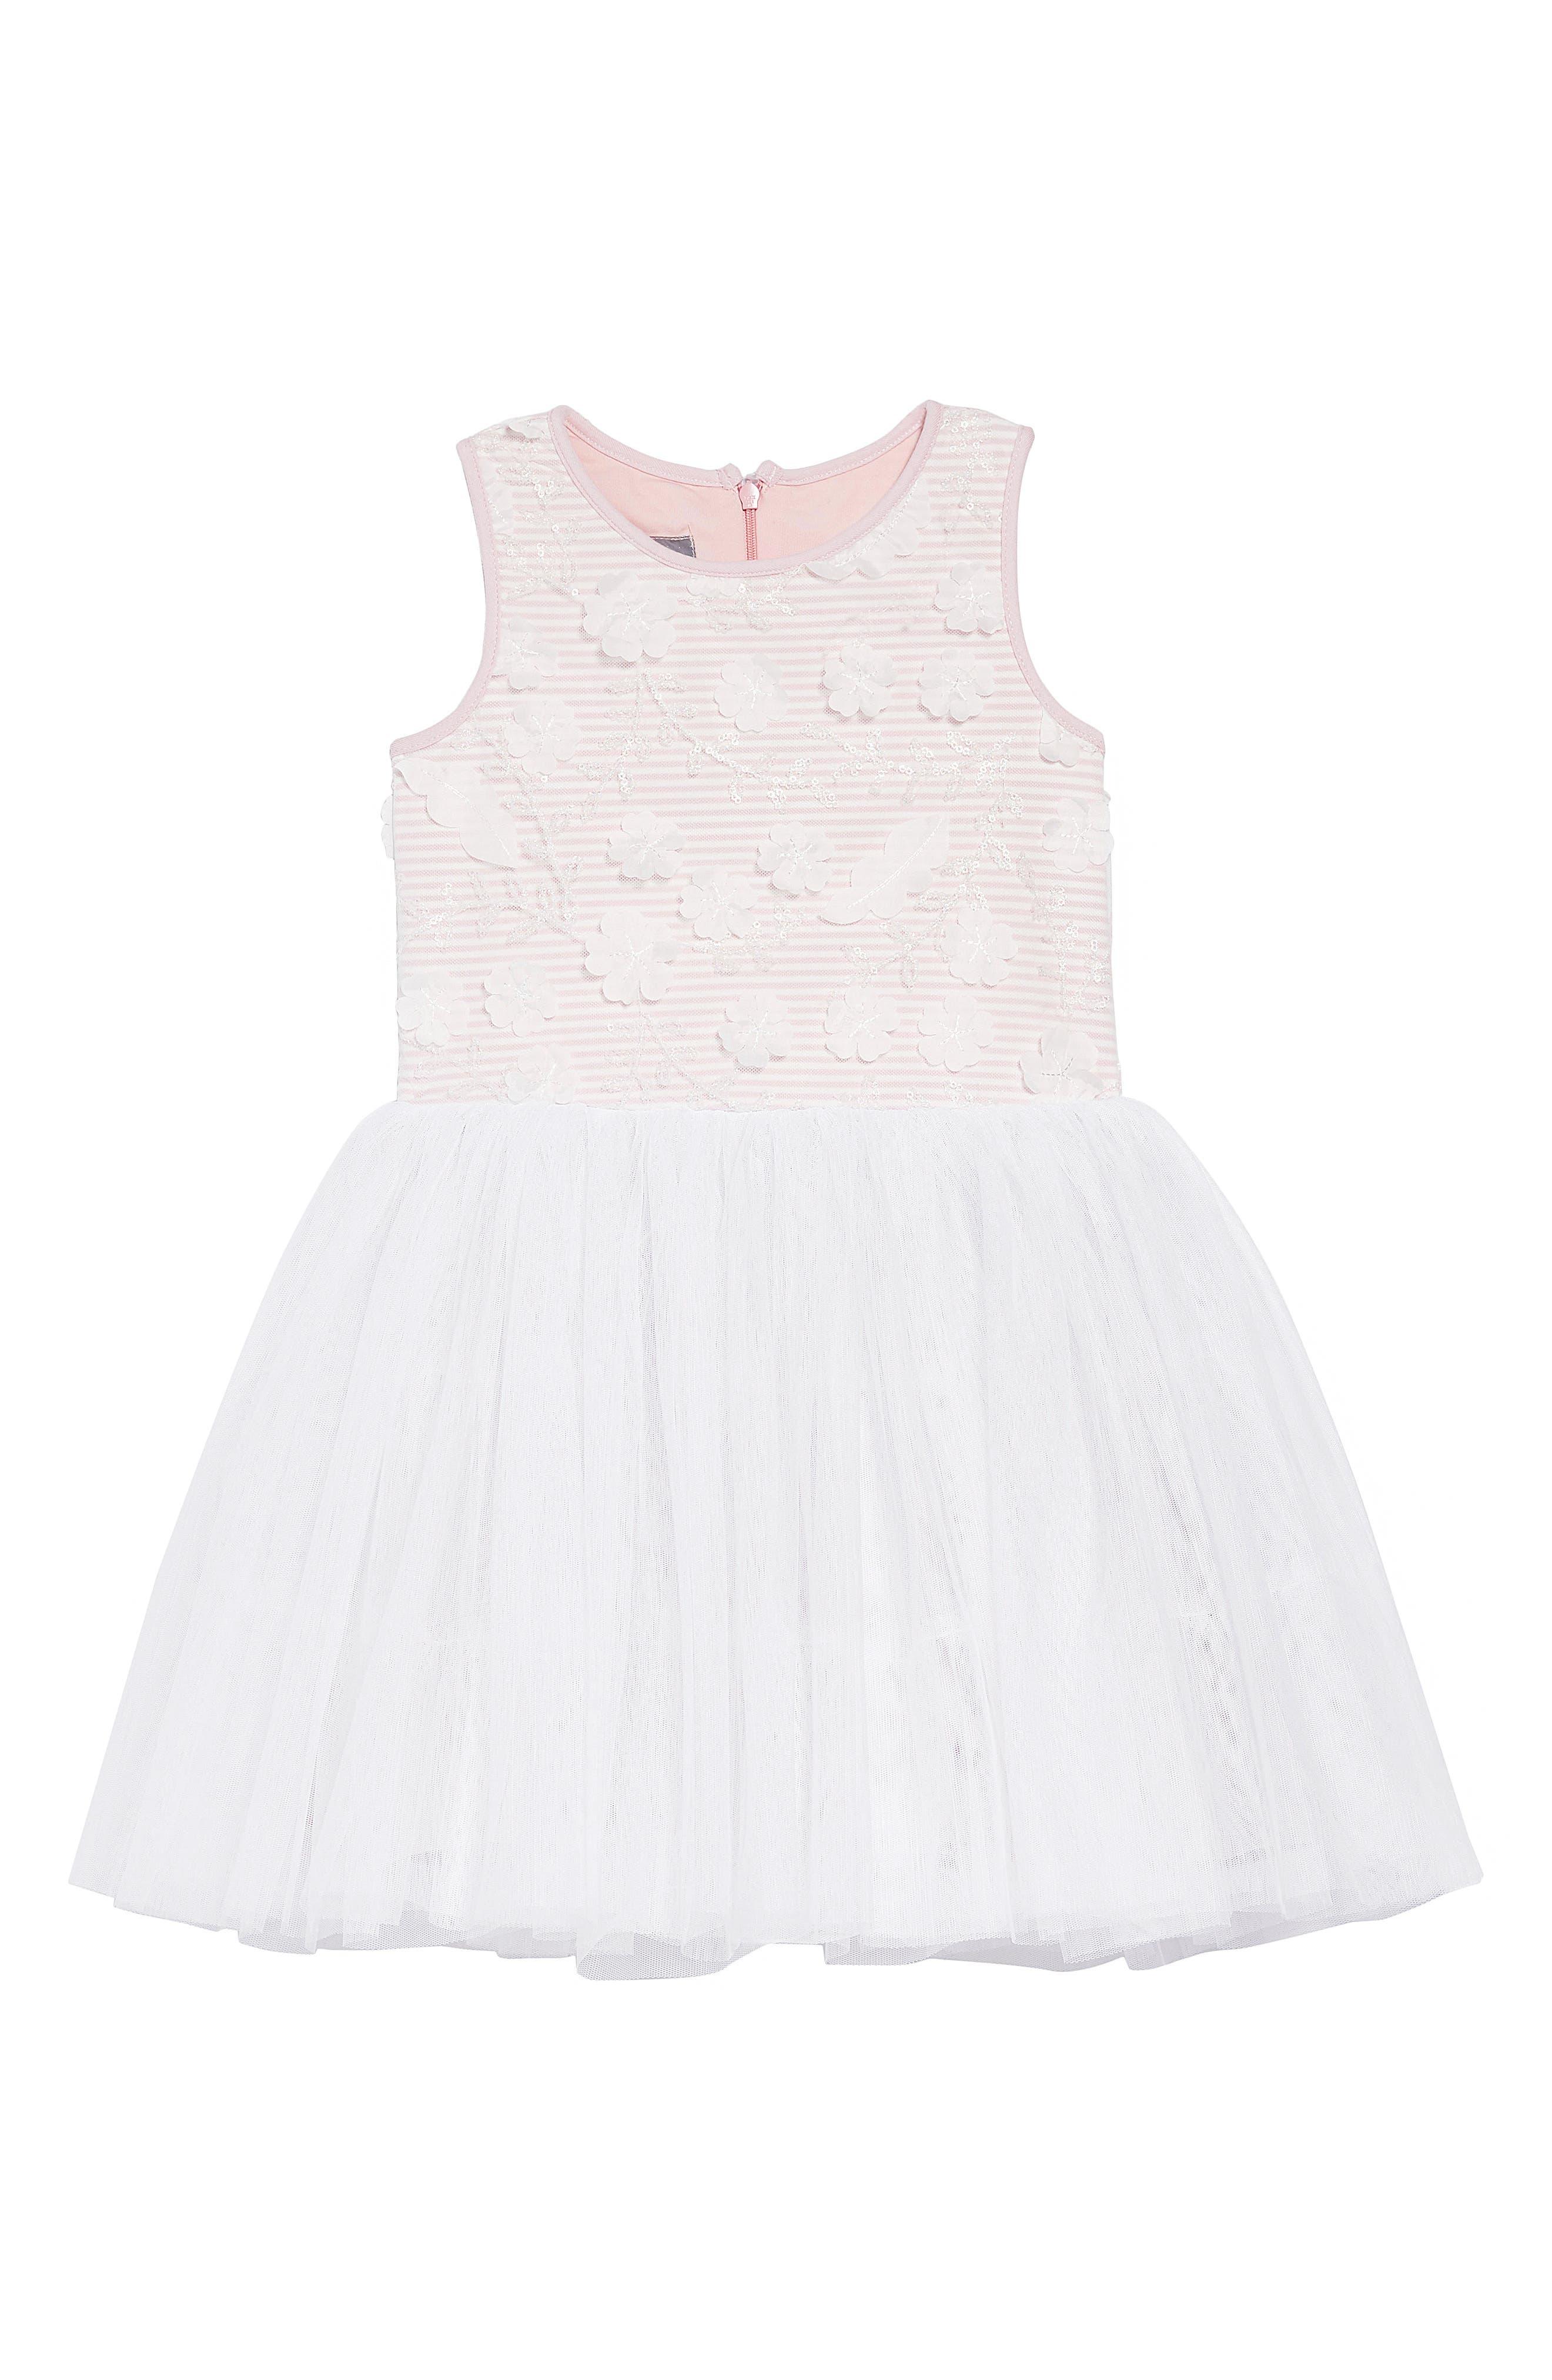 Embellished Bodice Dress,                             Main thumbnail 1, color,                             PINK/ WHITE